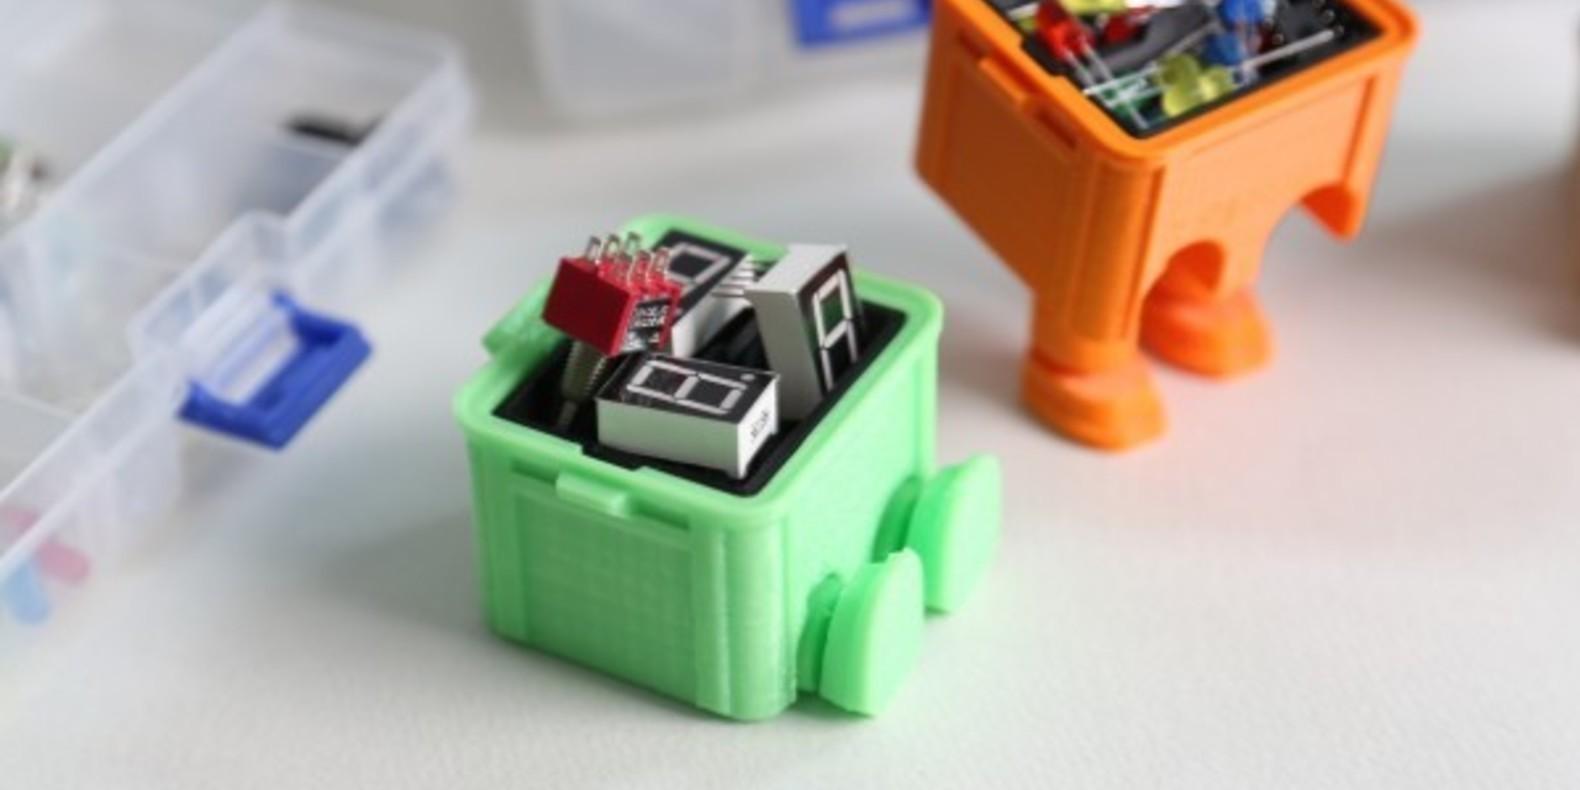 Step box step boite a outils tool box 3D printed 3D printing imprimée en 3D impression 3D Cults 3